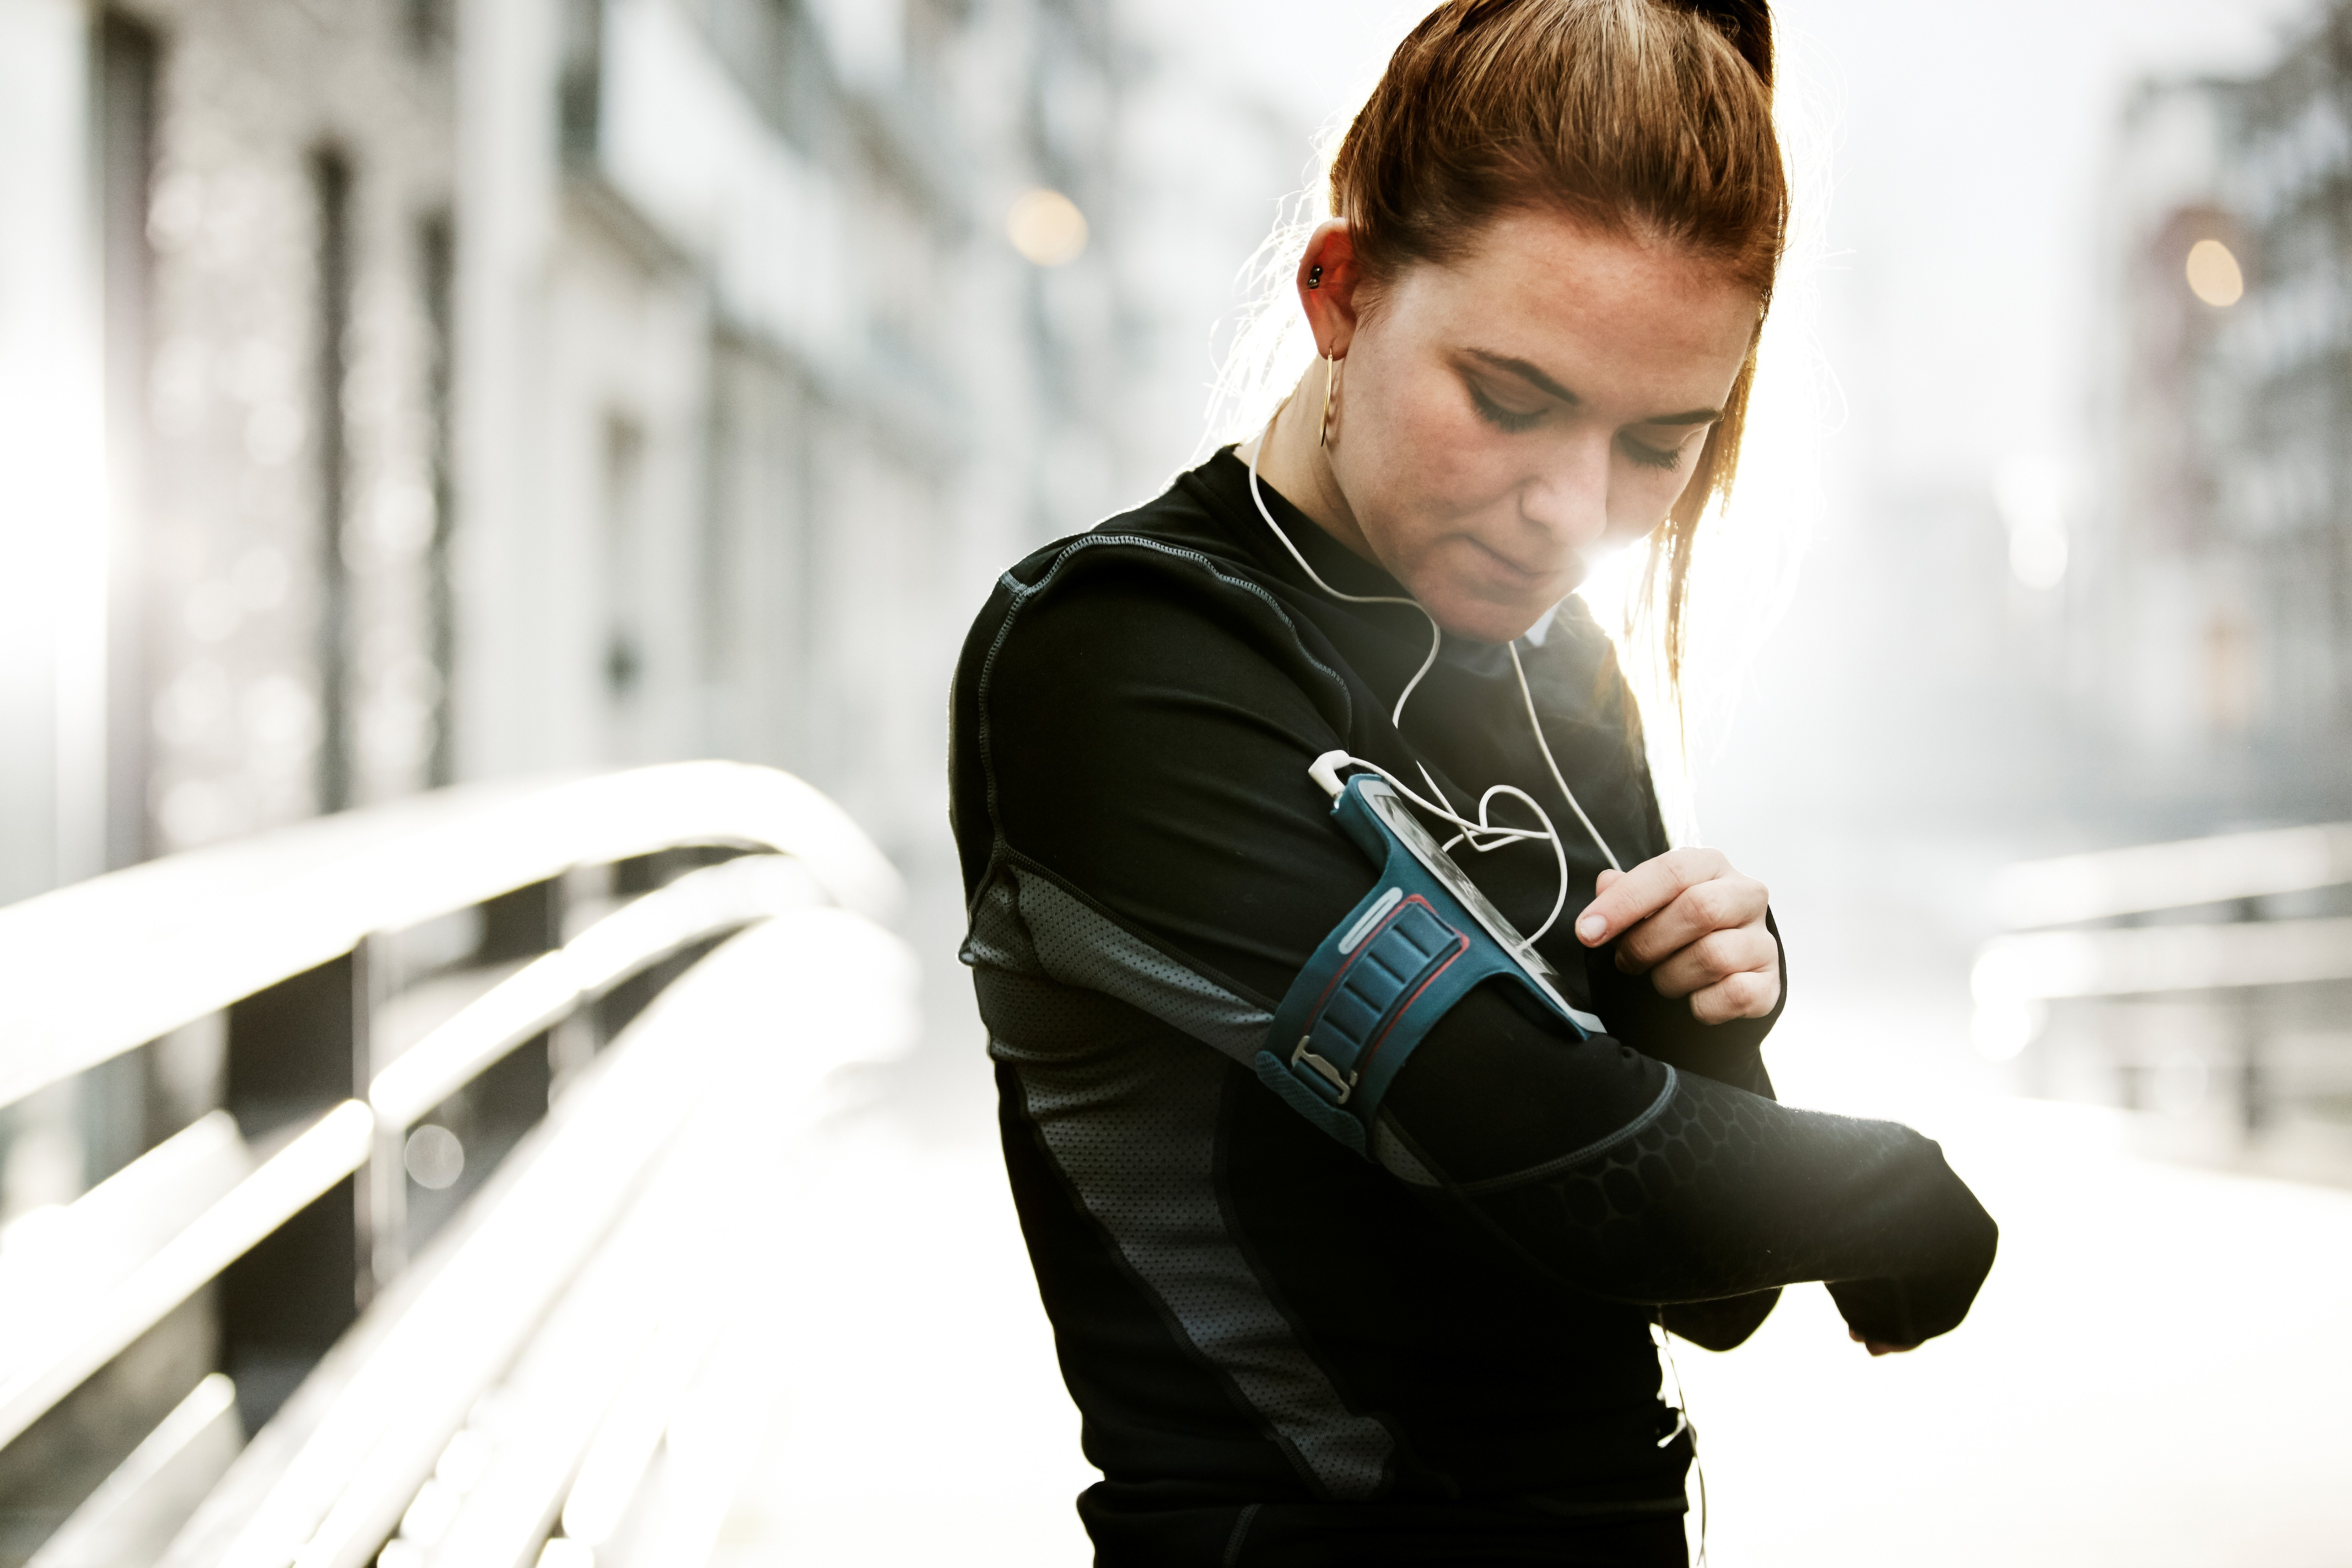 female runner in urban invironment